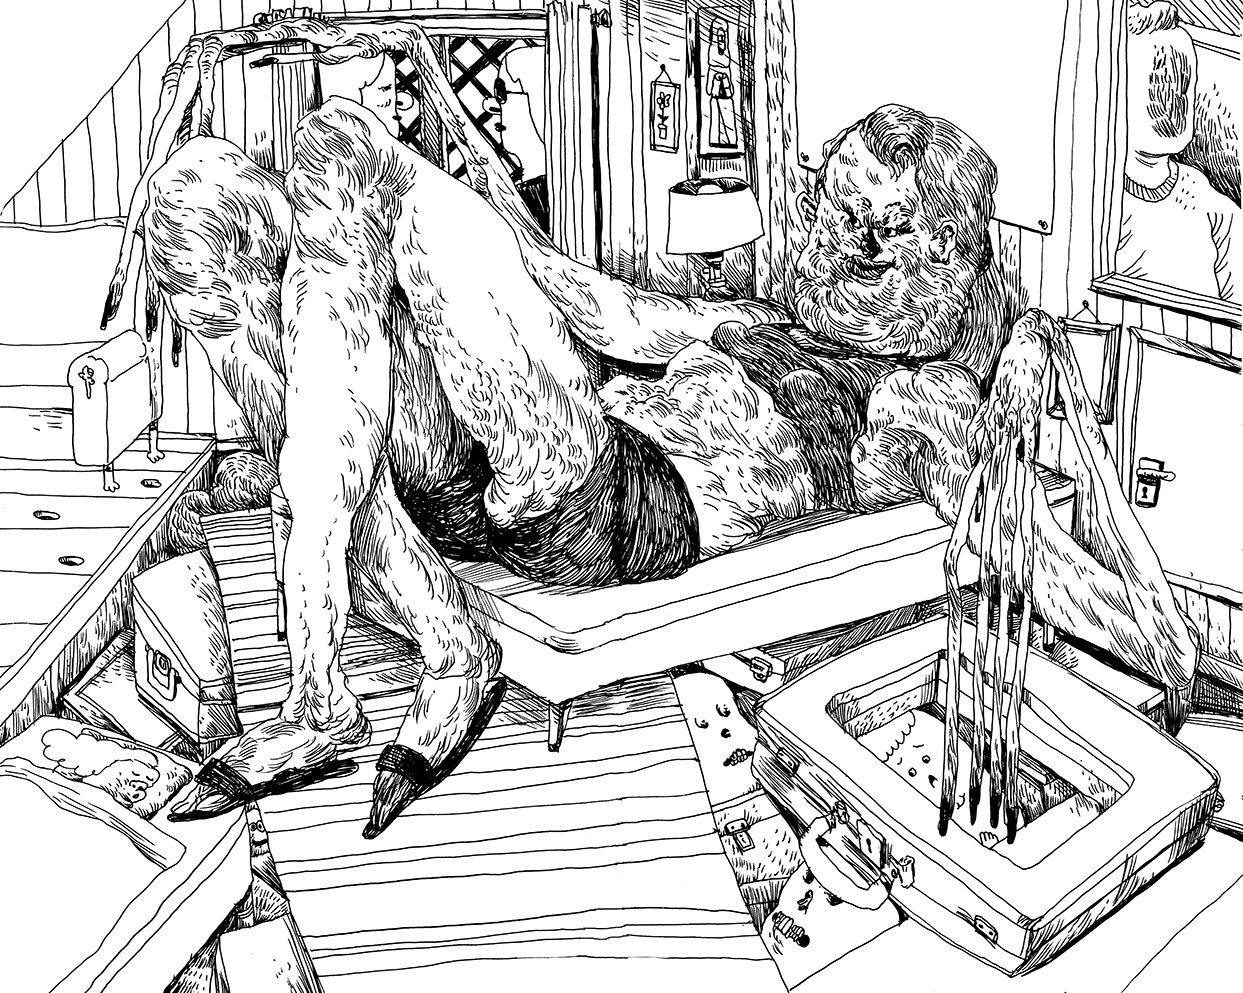 Artist of the Day: Erik Svetoft